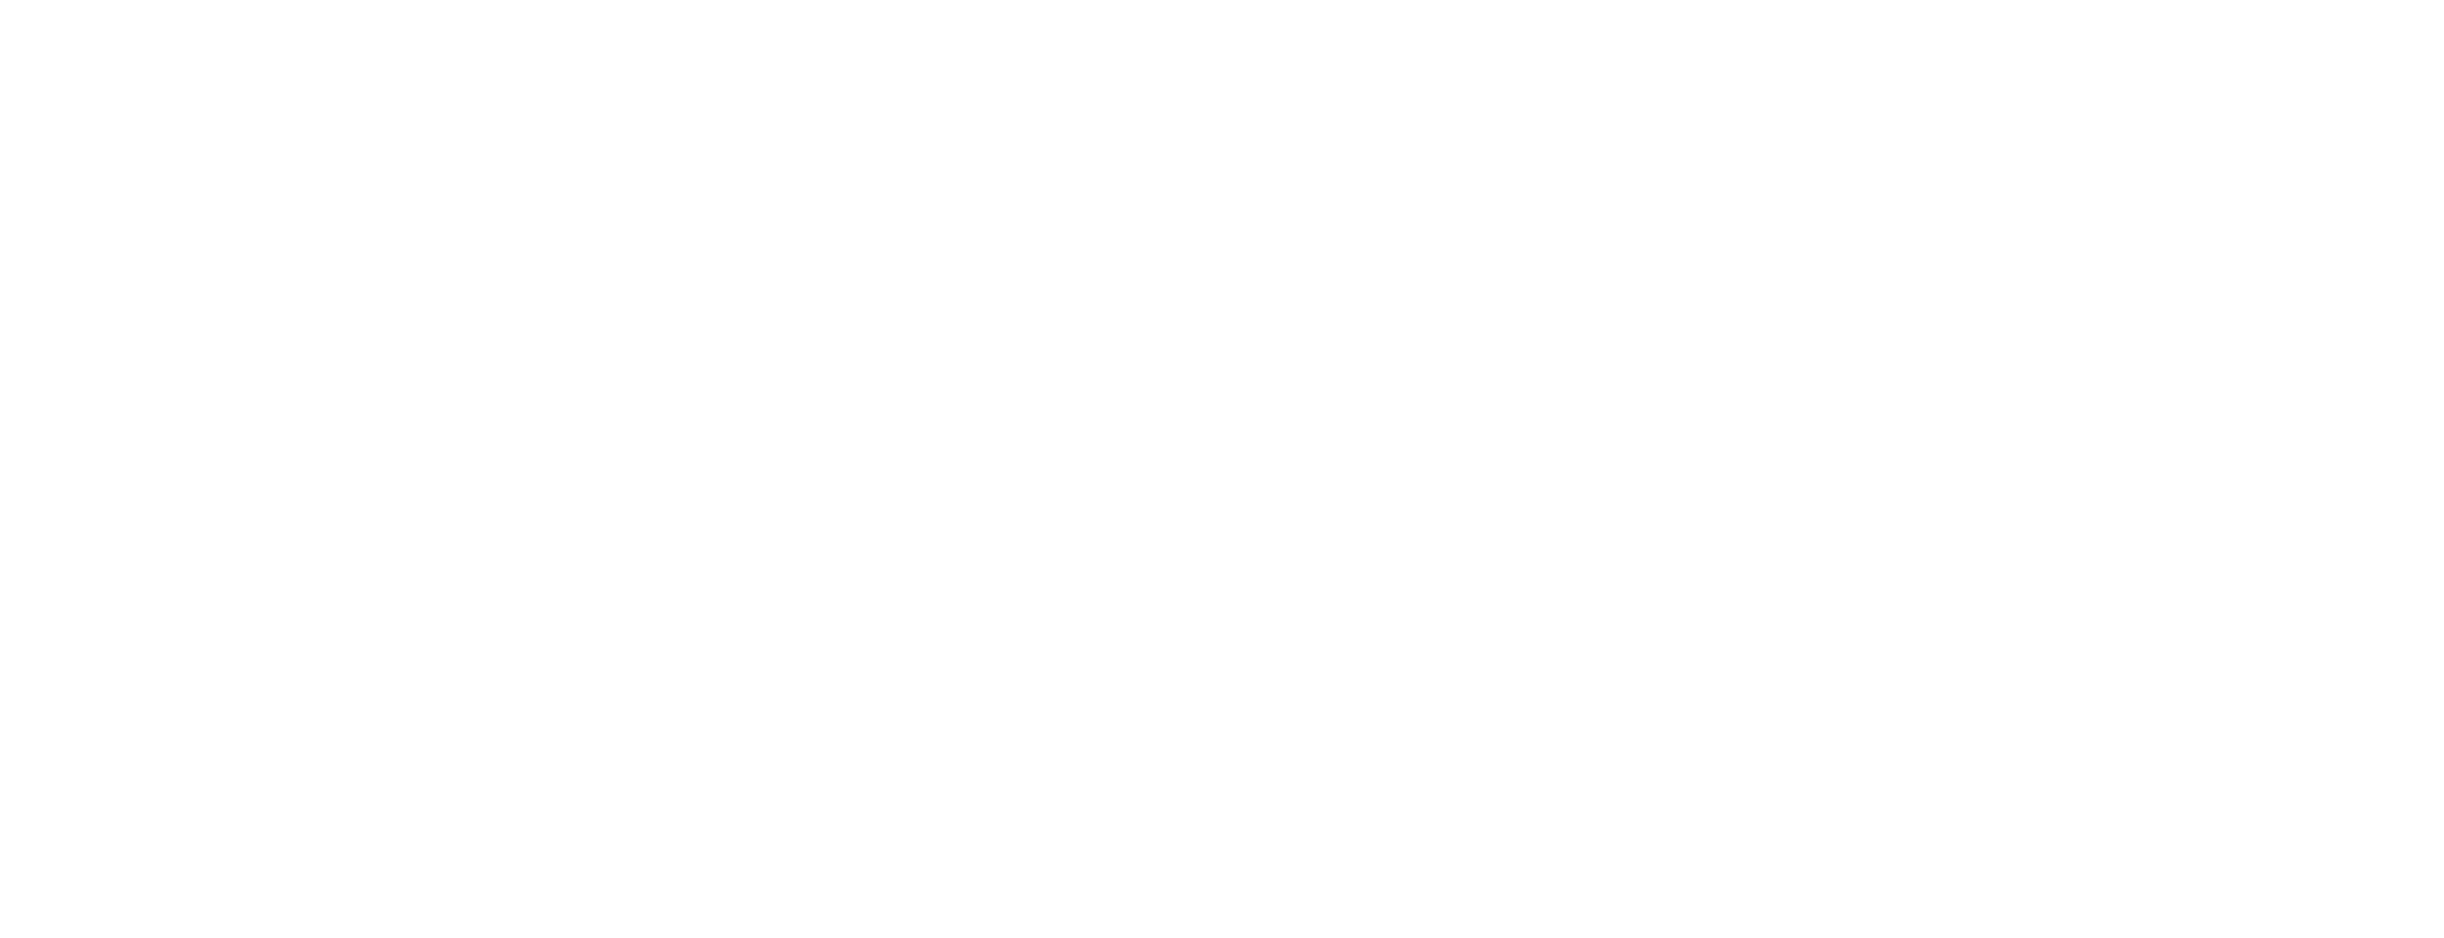 Sabonet Naturalmente Artesanal